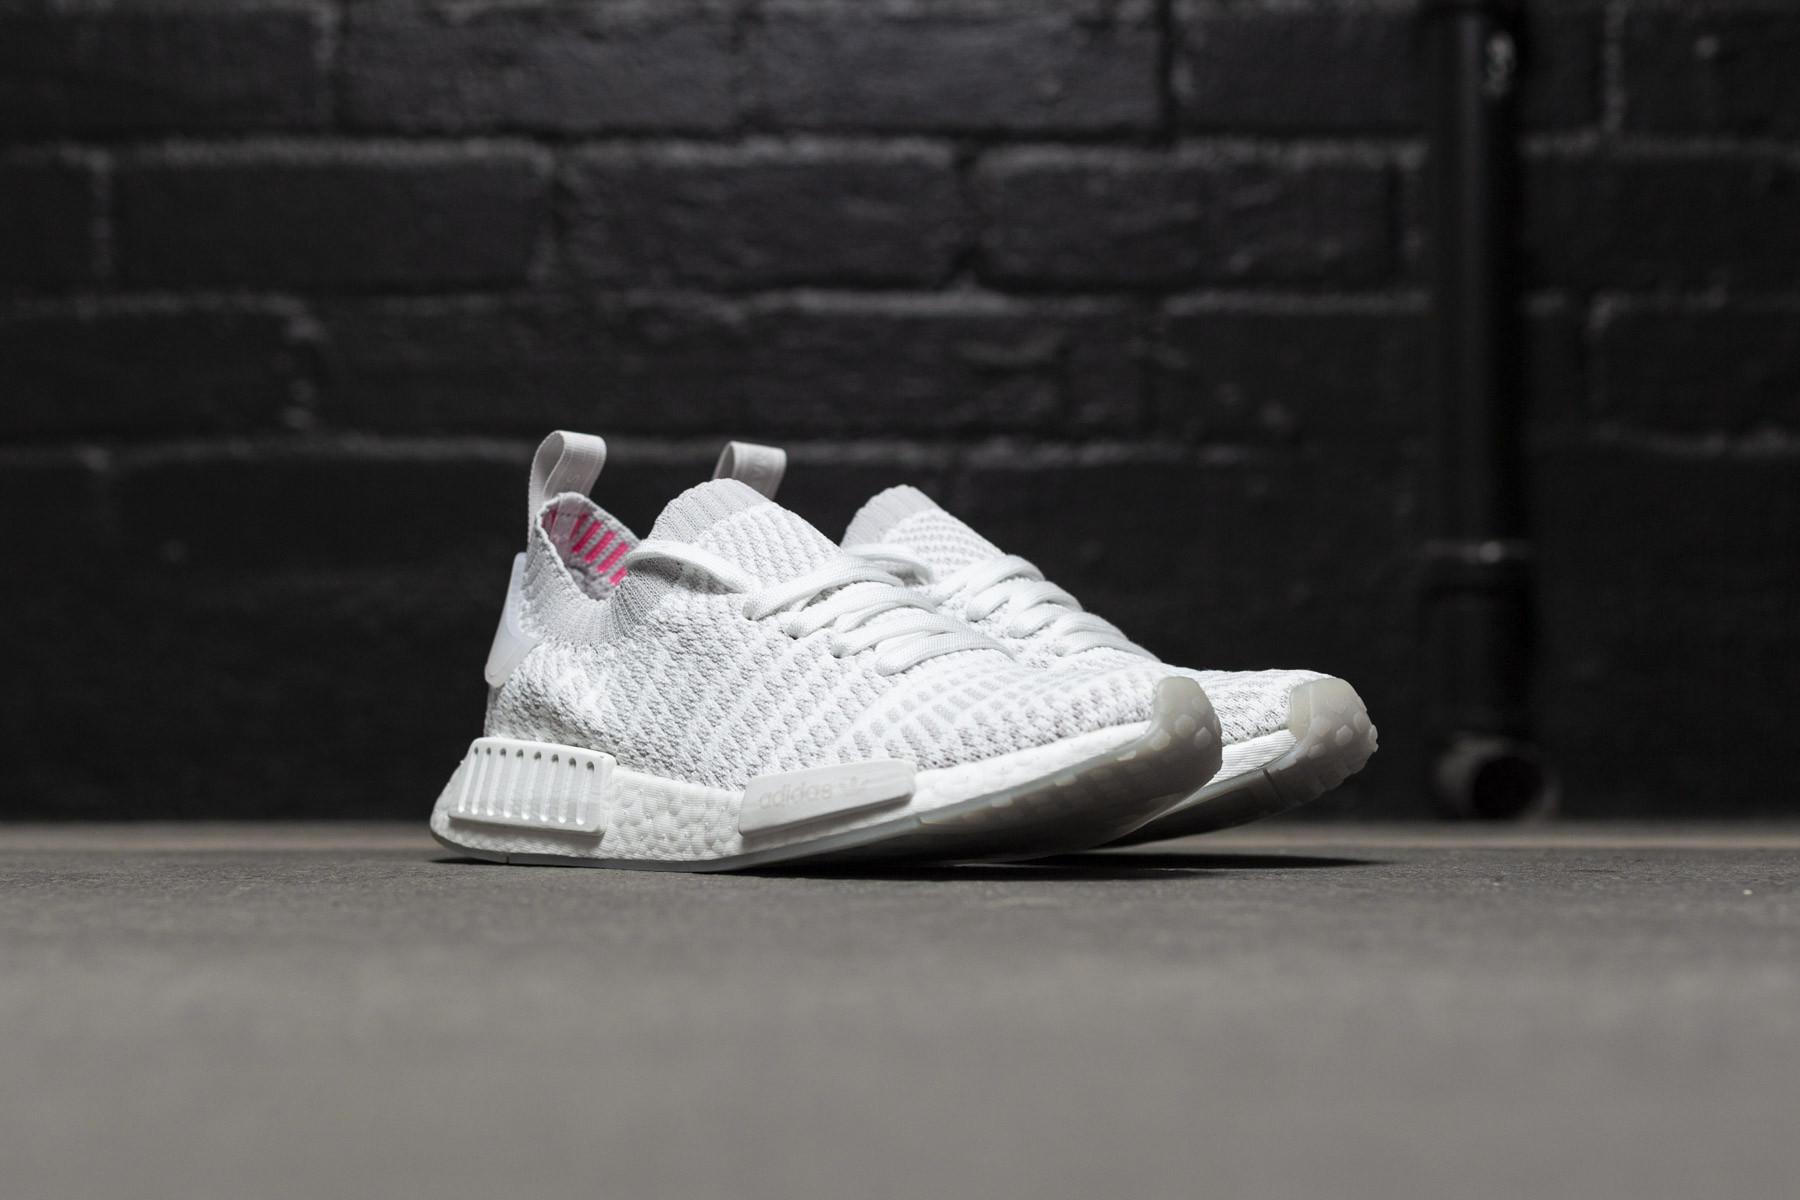 W Adidas NMD_R1 STLT PK Sneaker.no